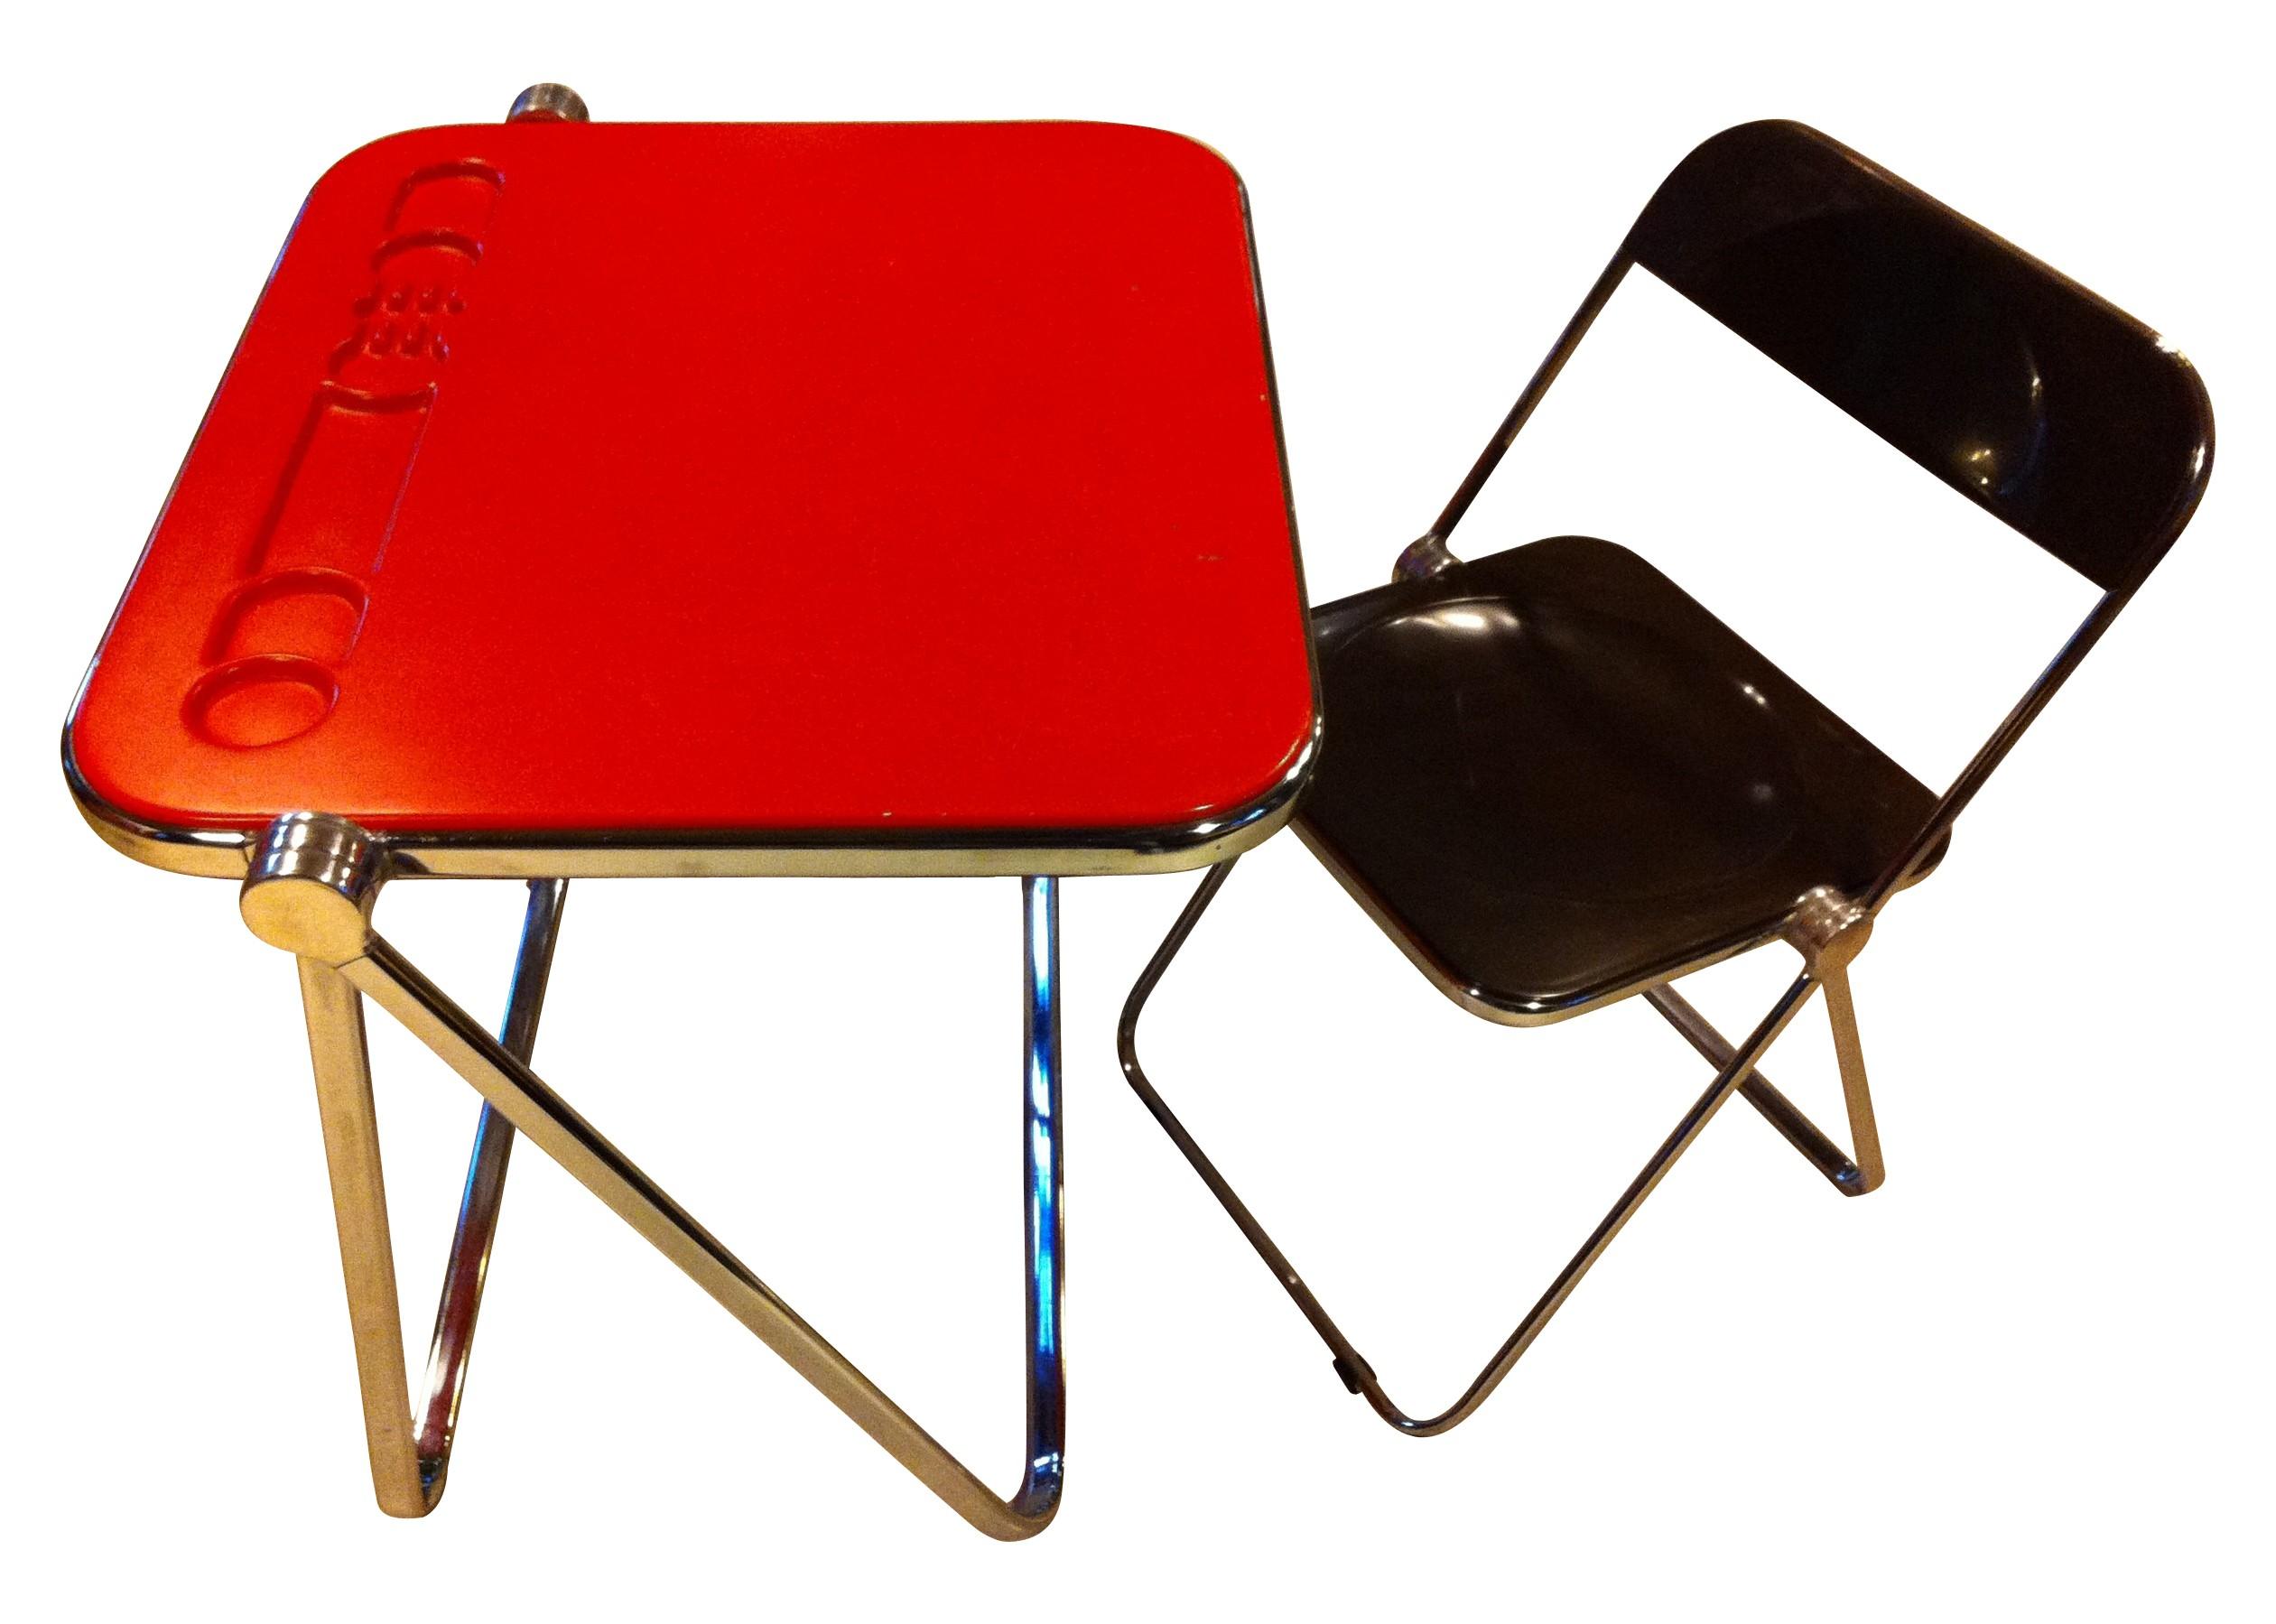 Desk and chair Plia in fiber glass and metal Giancarlo PIRETTI